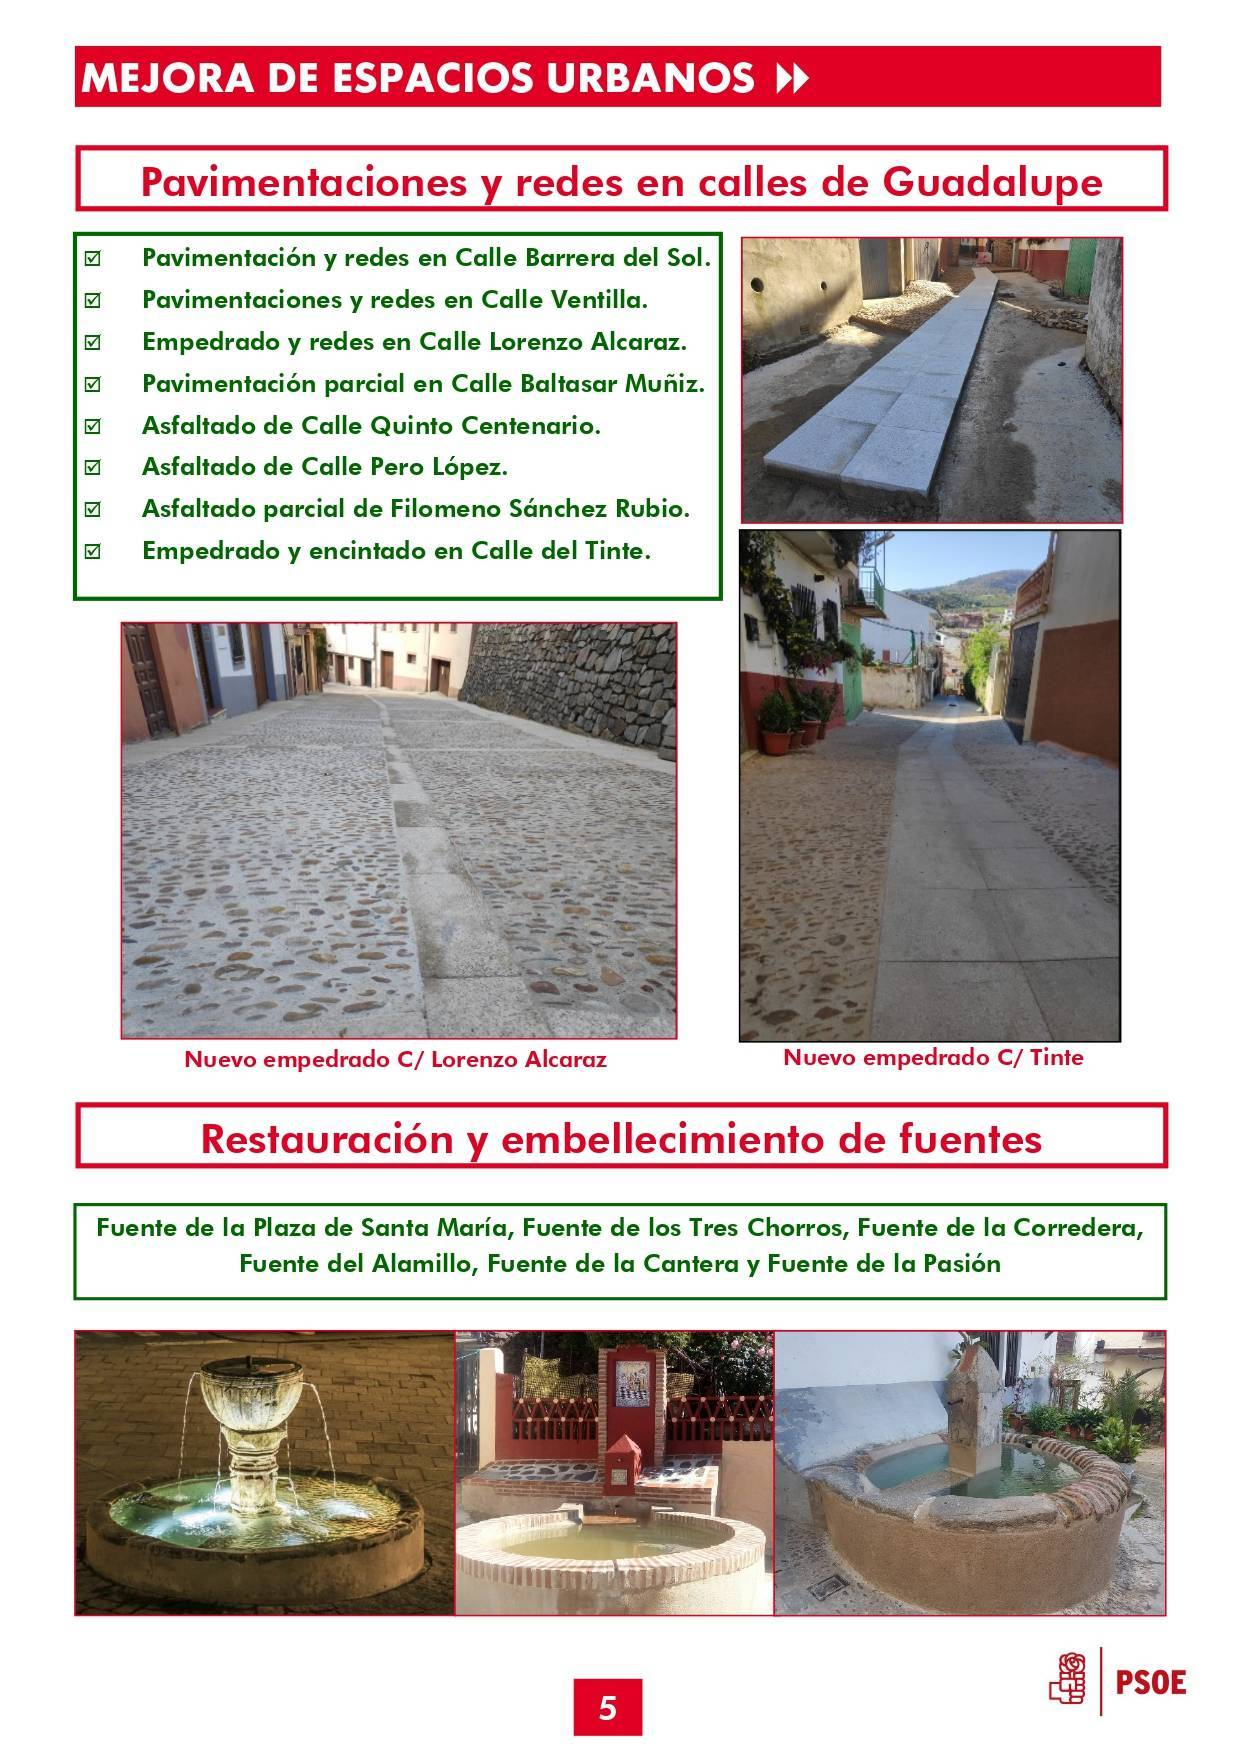 Boletín informativo de gestión municipal 2015-2019 - Guadalupe (Cáceres) 5